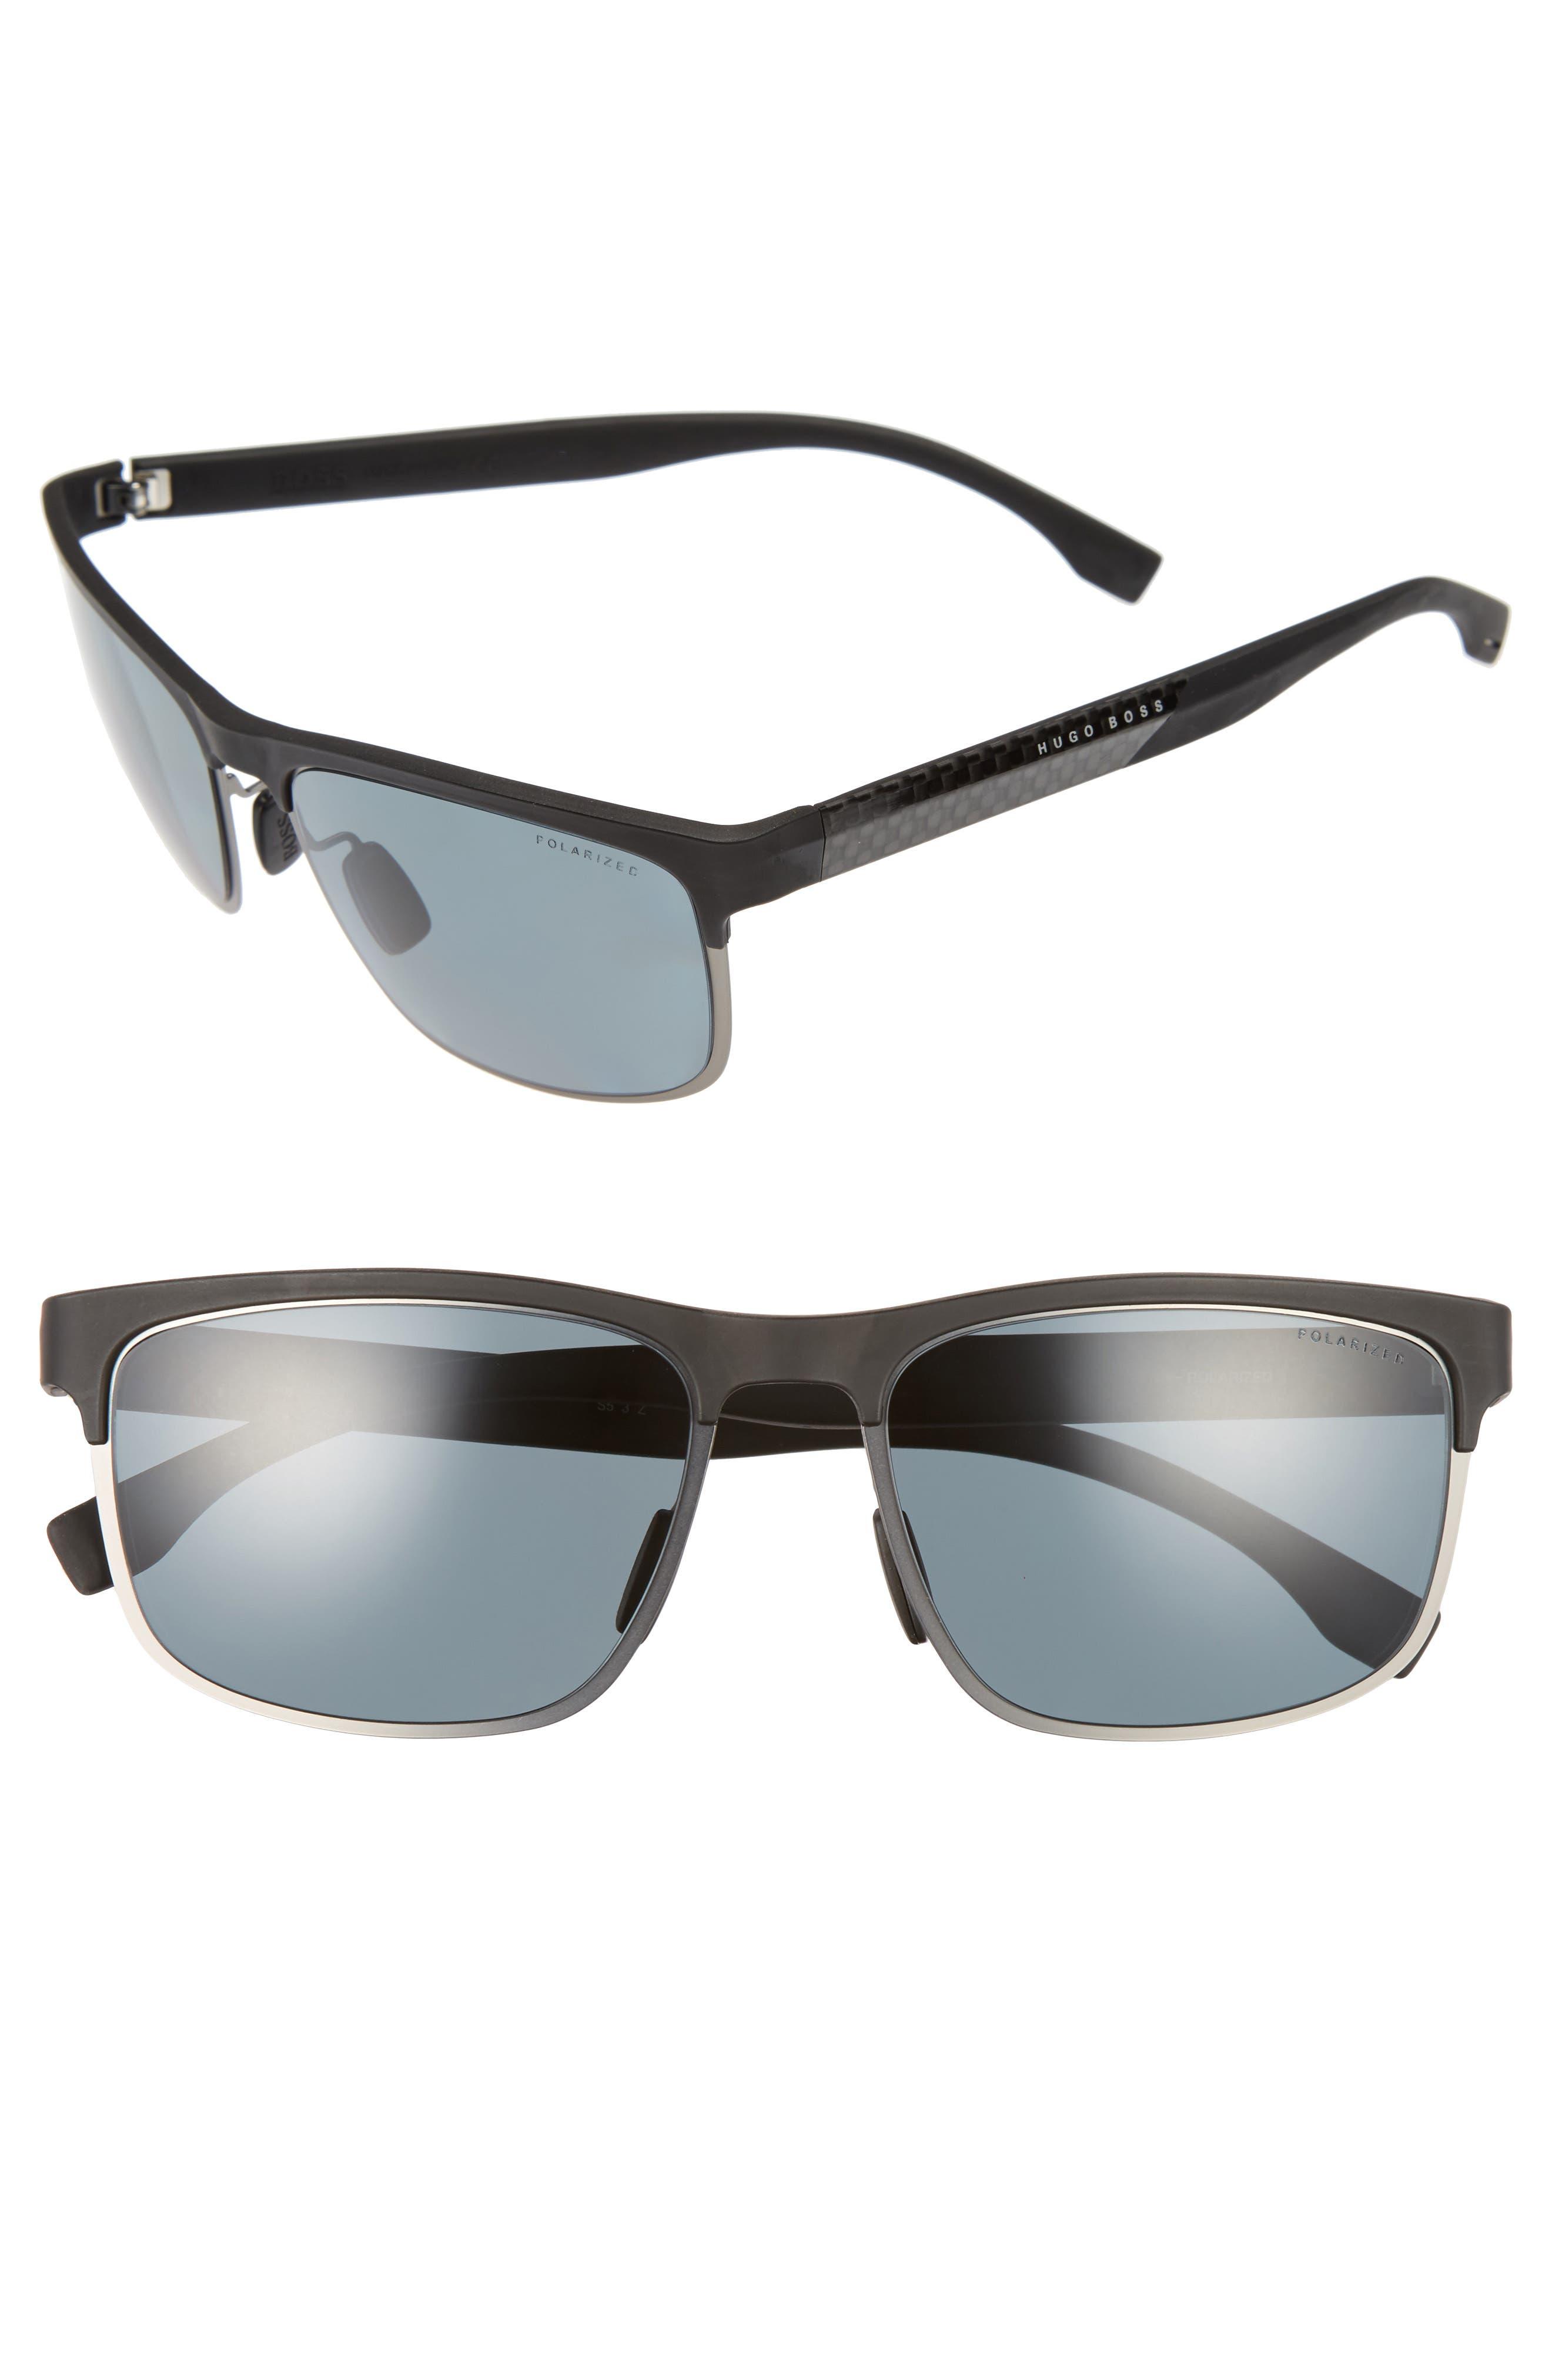 58mm Polarized Sunglasses,                         Main,                         color, 001